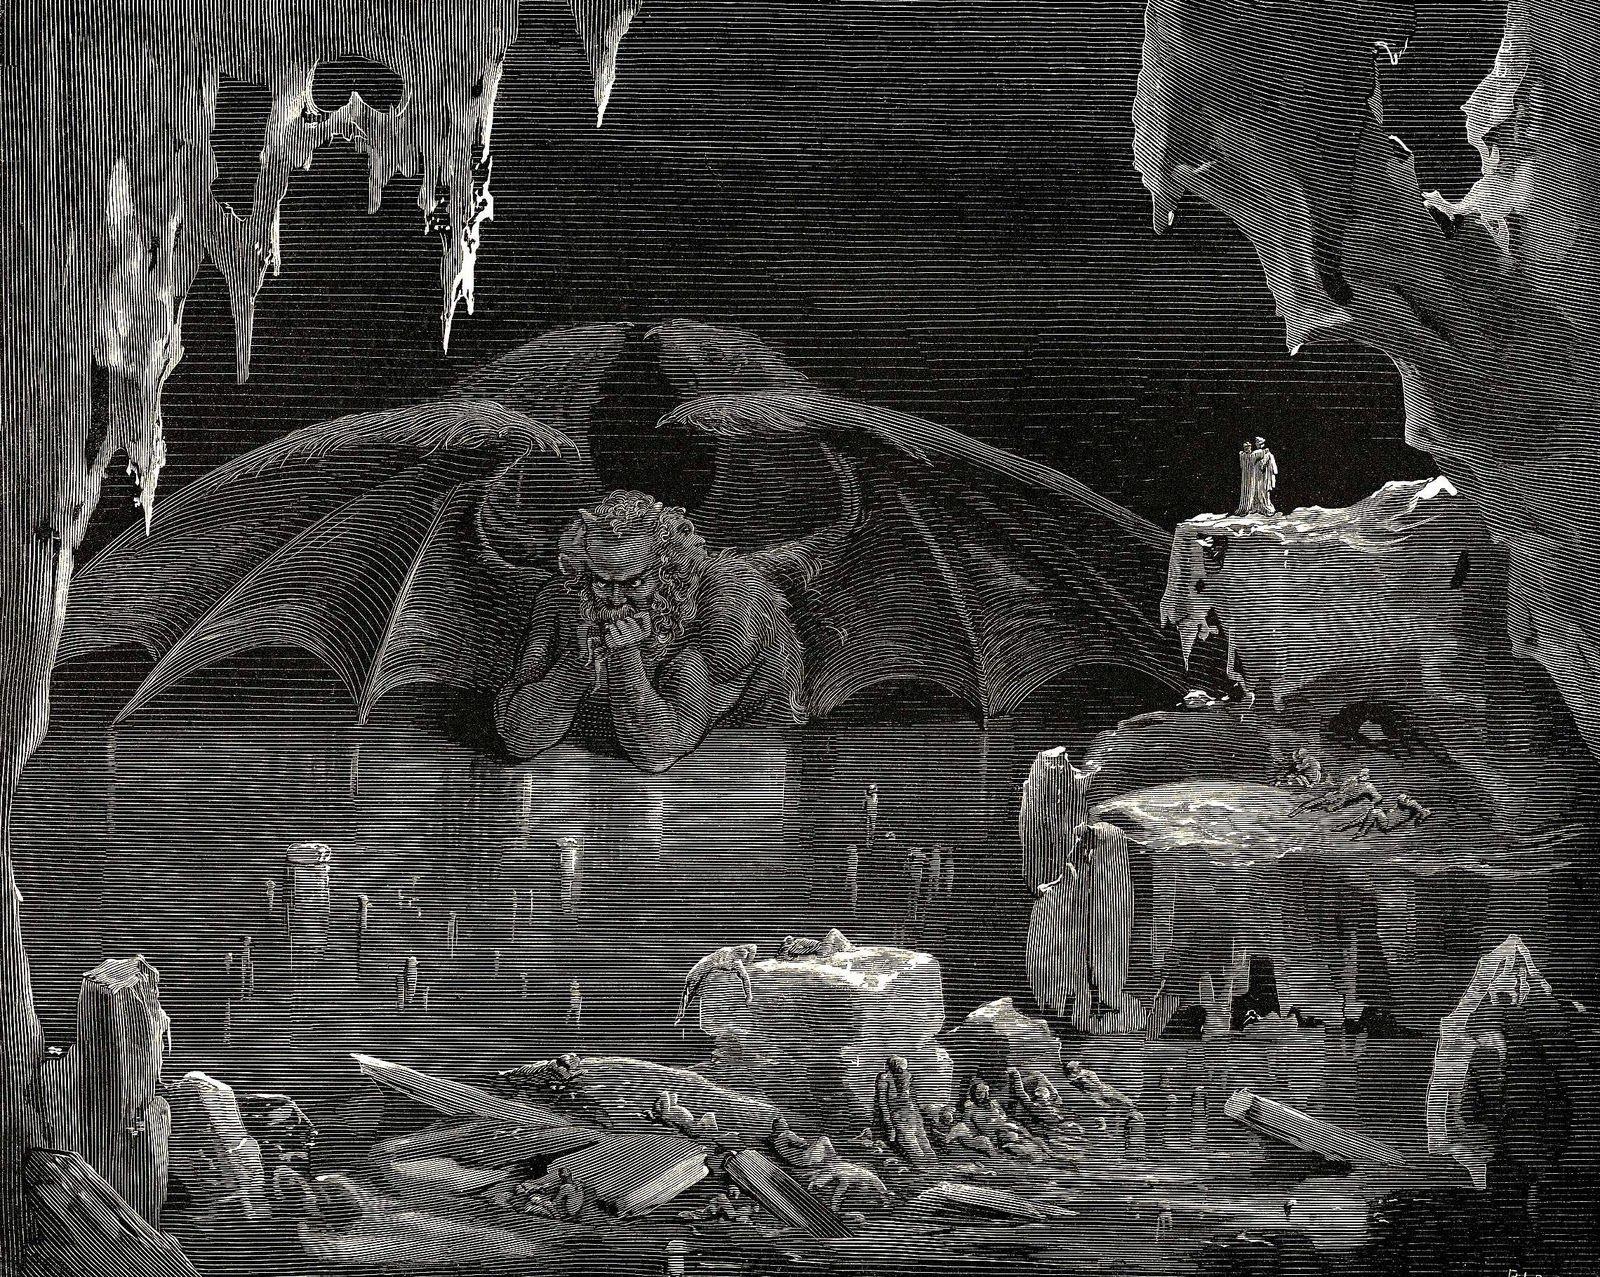 Lucifer en el infierno la Divina Comedia